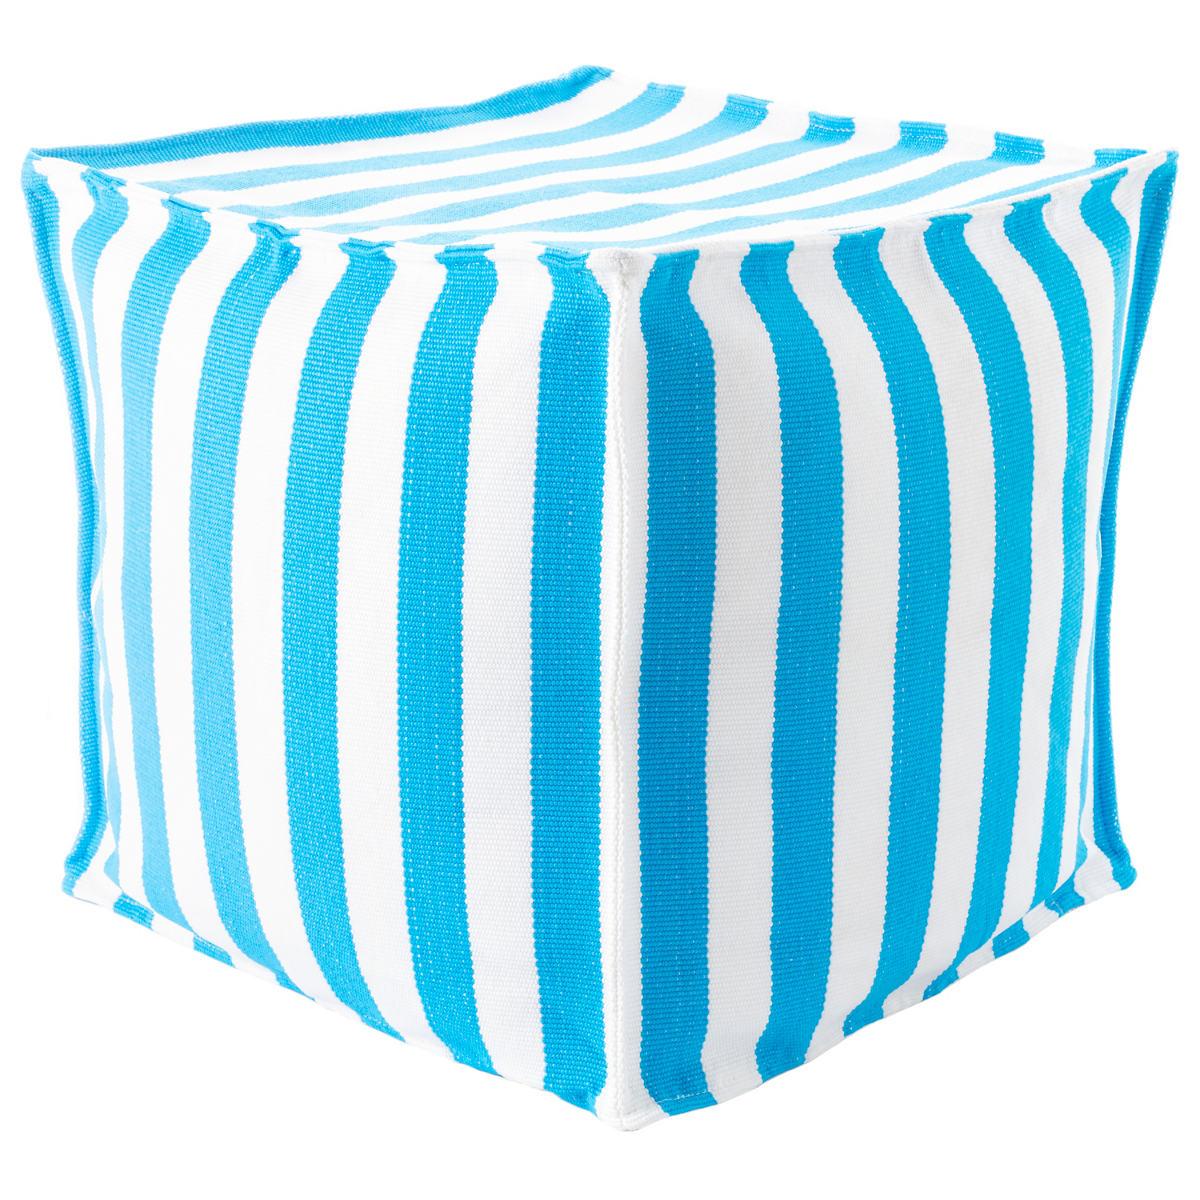 Trimaran Stripe Turquoise/White Indoor/Outdoor Mini Pouf